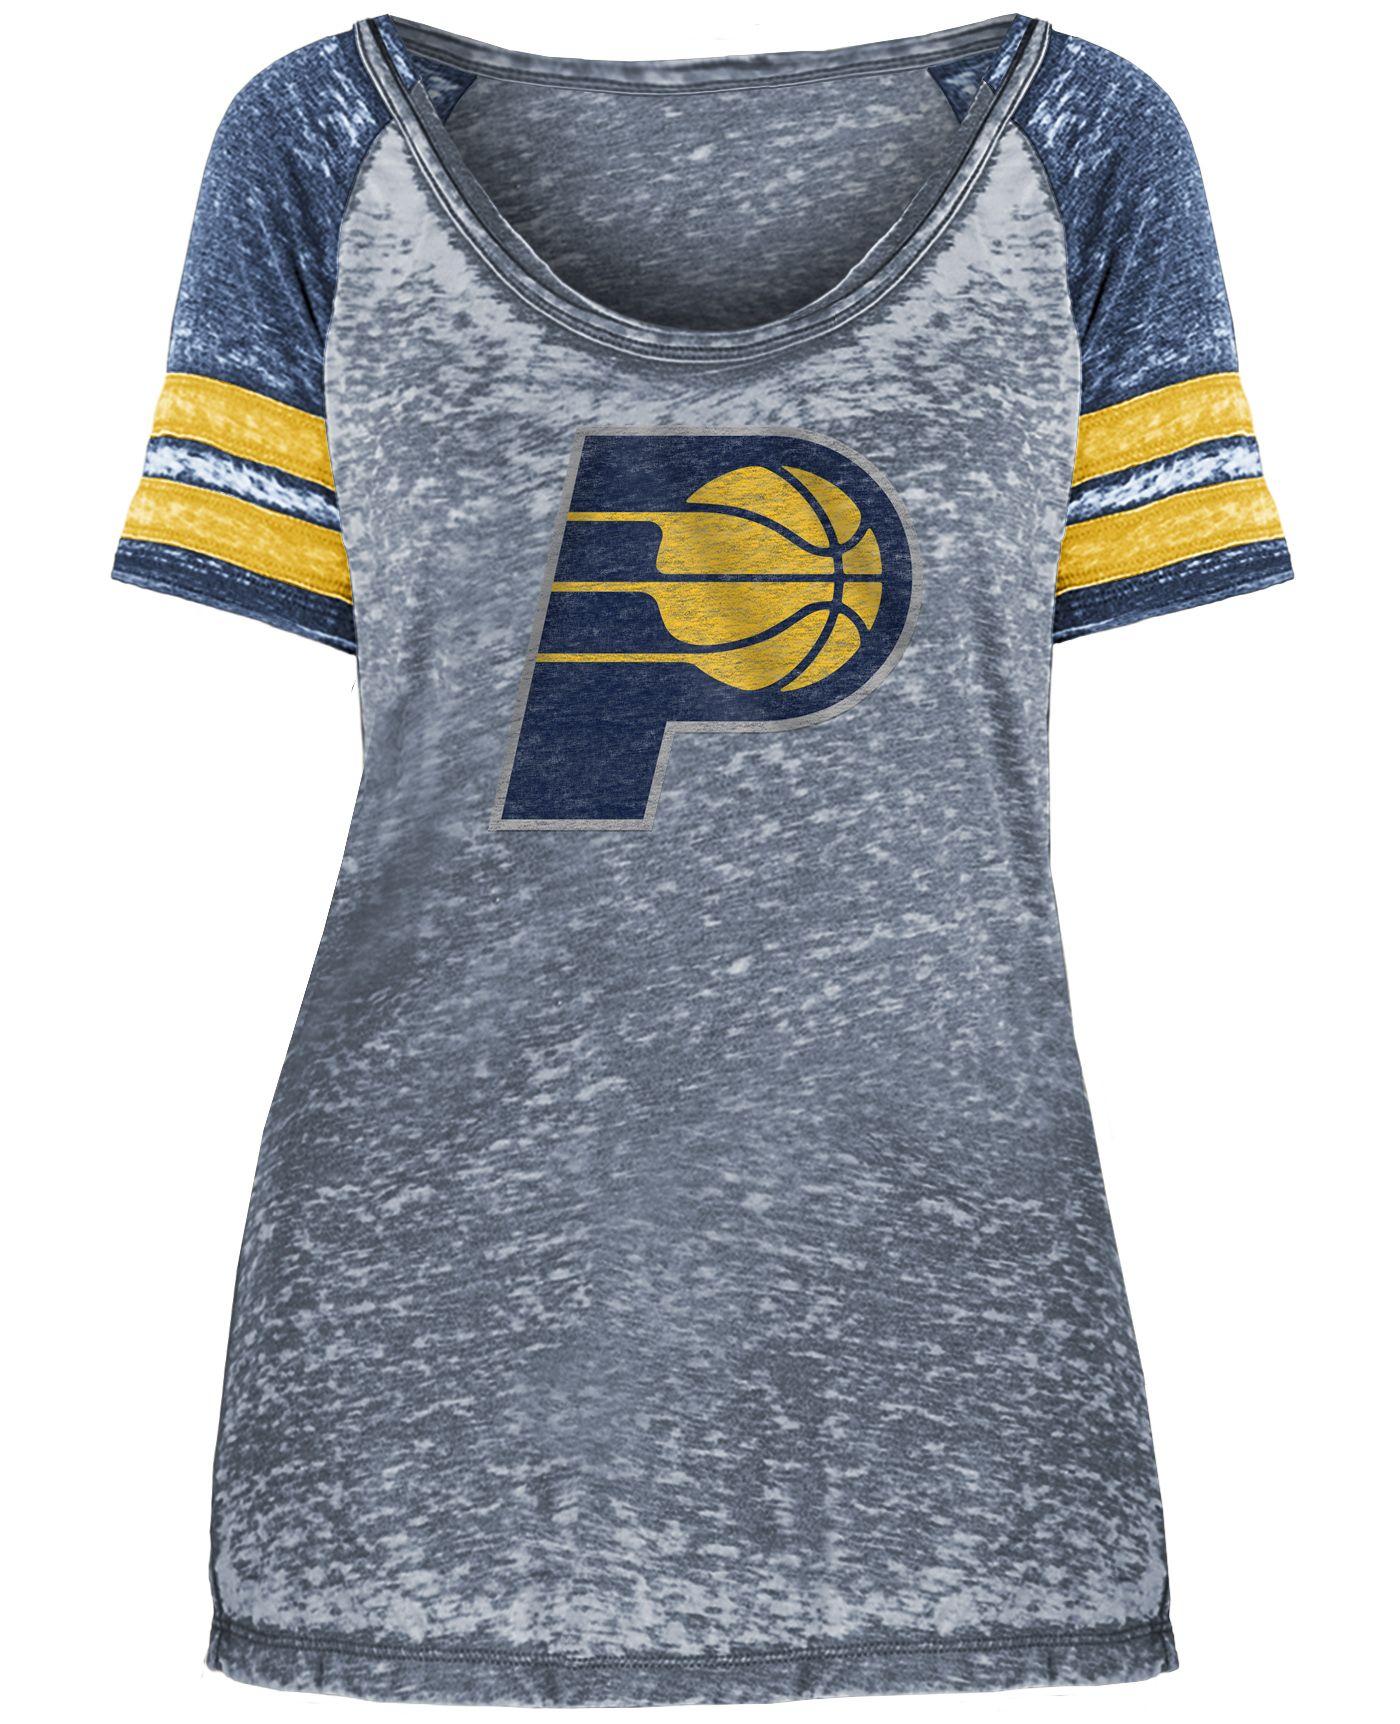 New Era Women's Indiana Pacers Burnout Scoop Neck T-Shirt